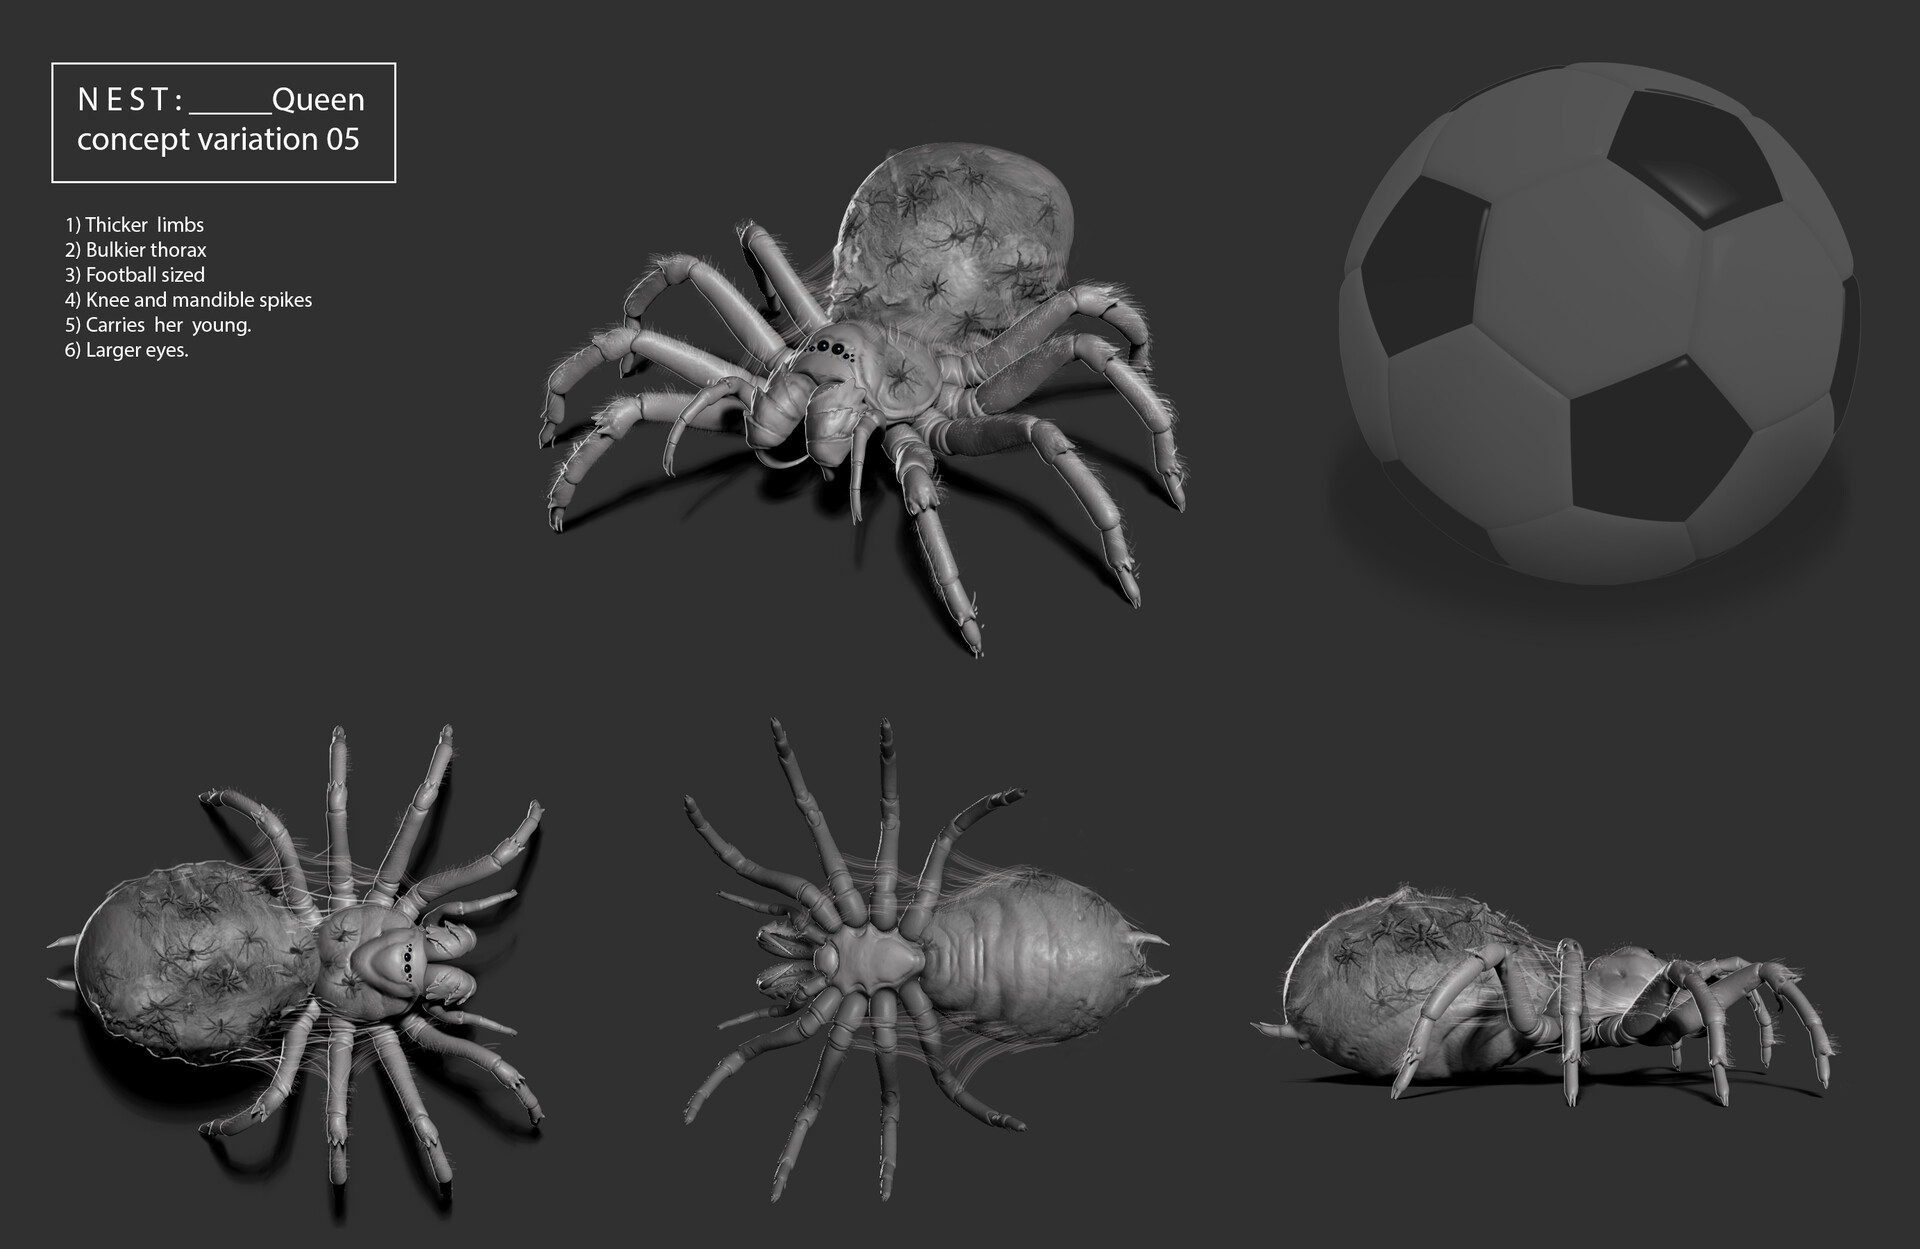 Concept illustration, variant explorations.